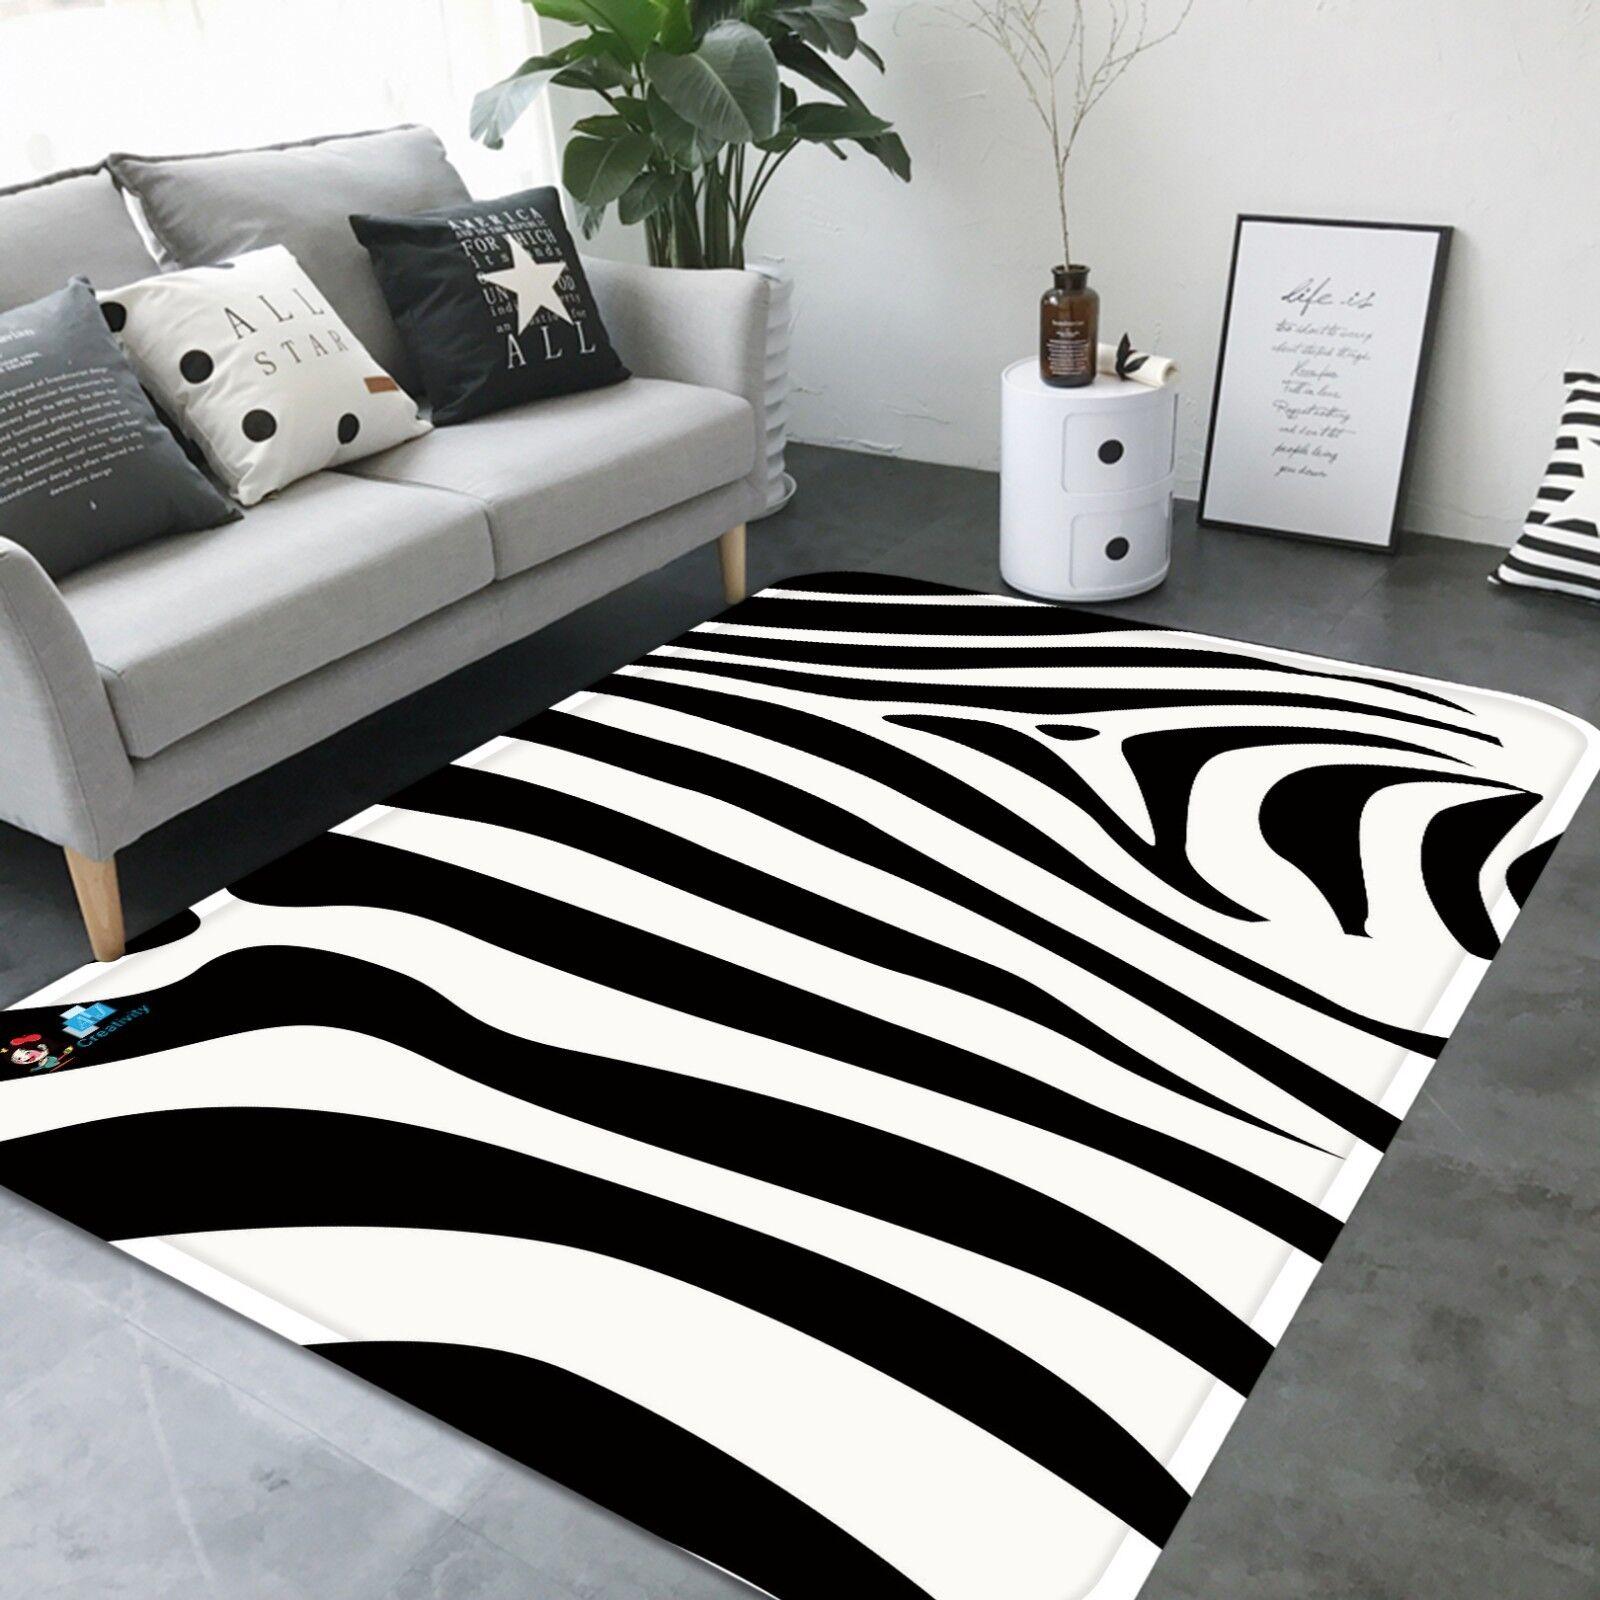 3D Zebra Texture 582 Non Non Non Slip Rug Mat Room Mat Quality Elegant Photo Carpet US 7ca954